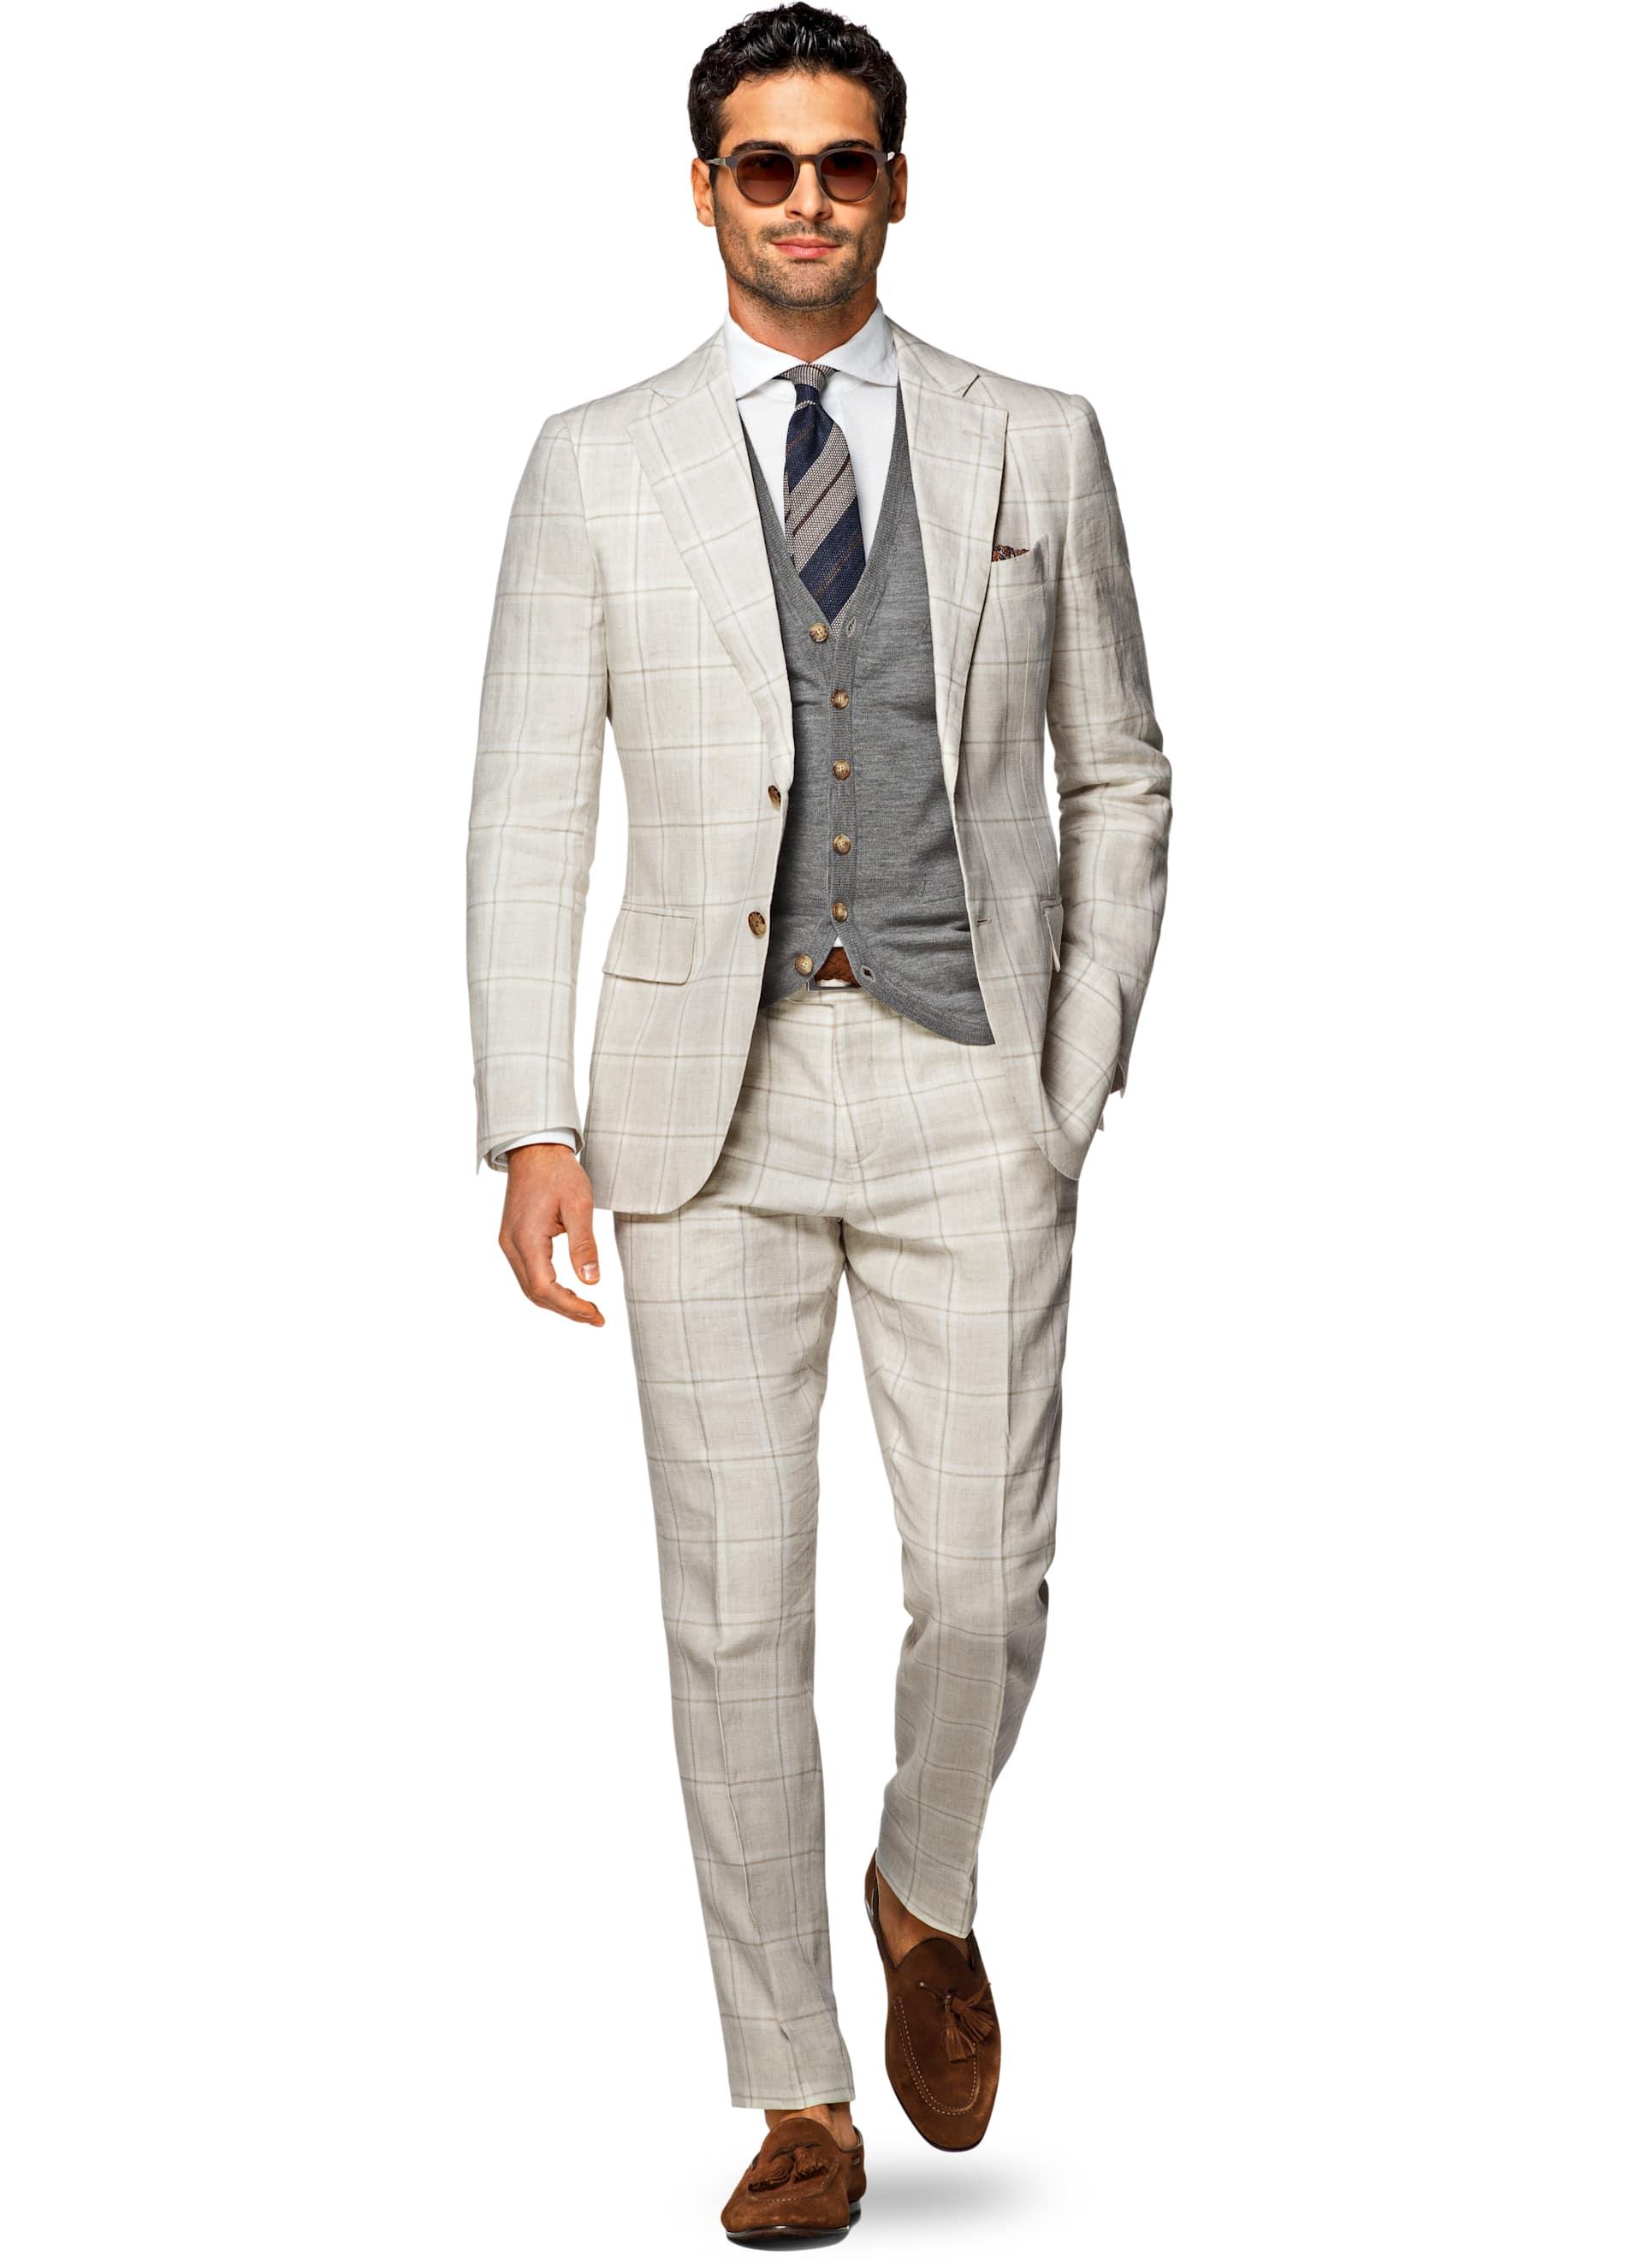 Suit Light Brown Check Lazio P5183i | Suitsupply Online Store